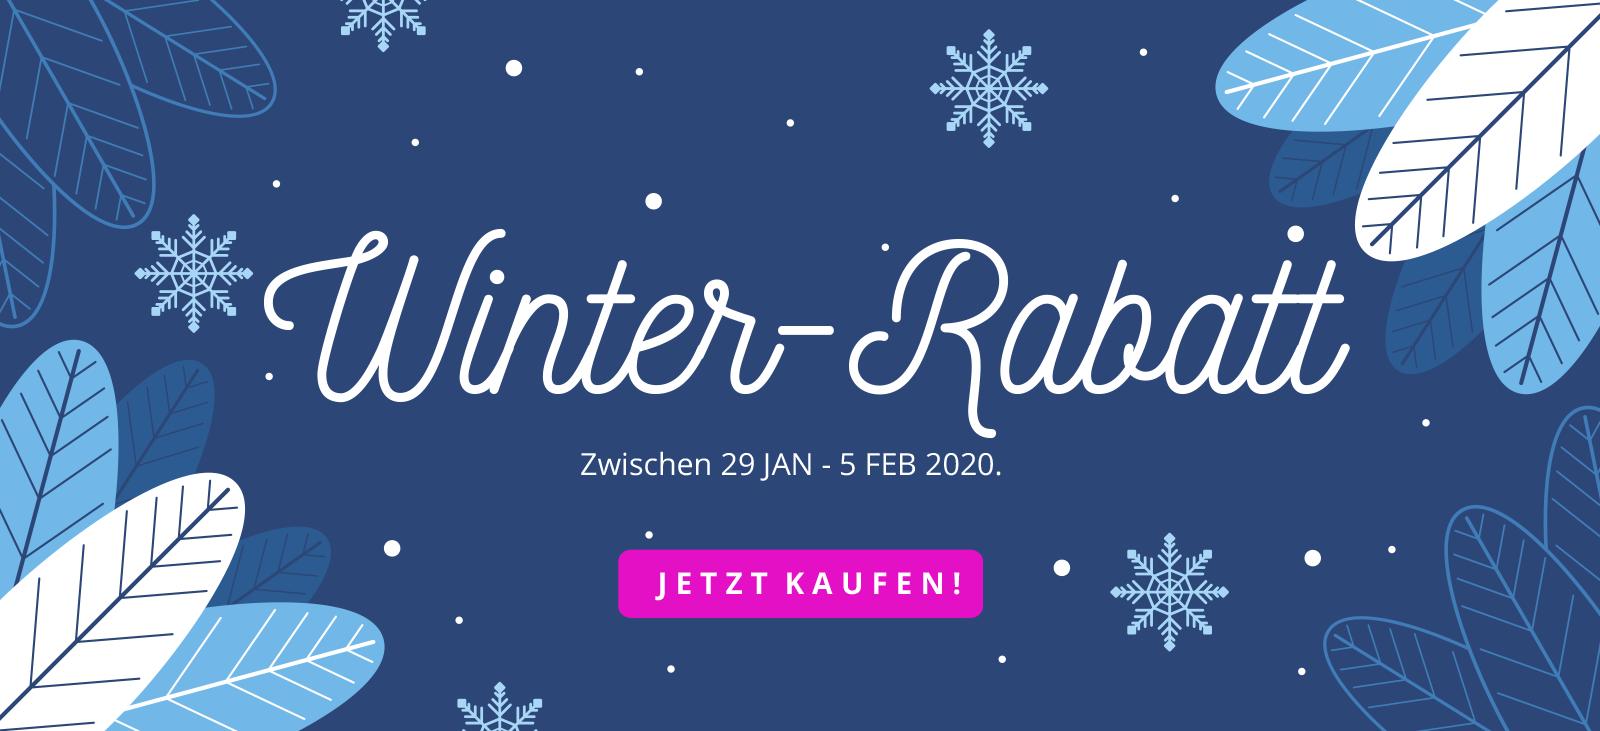 Virivee Winter-Rabatt